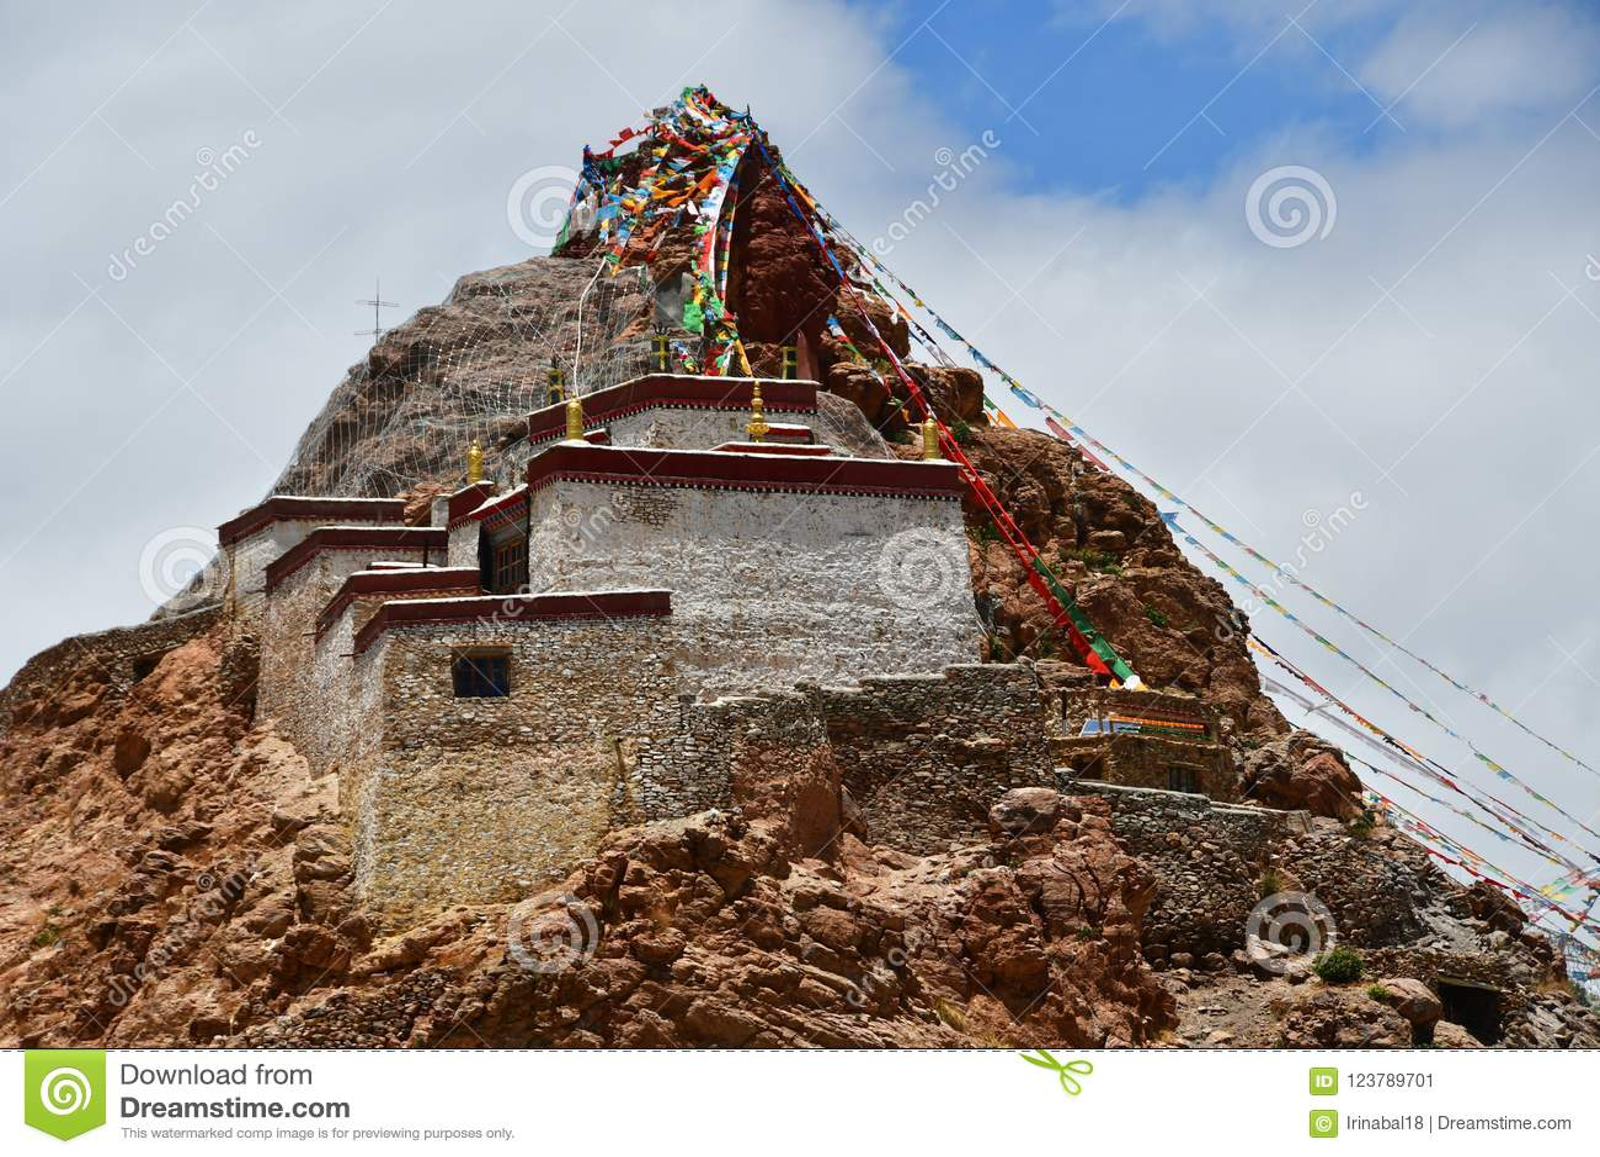 China, Tibet, Chiu Gompa monastery on a hill on the shore of lake Manasarovar